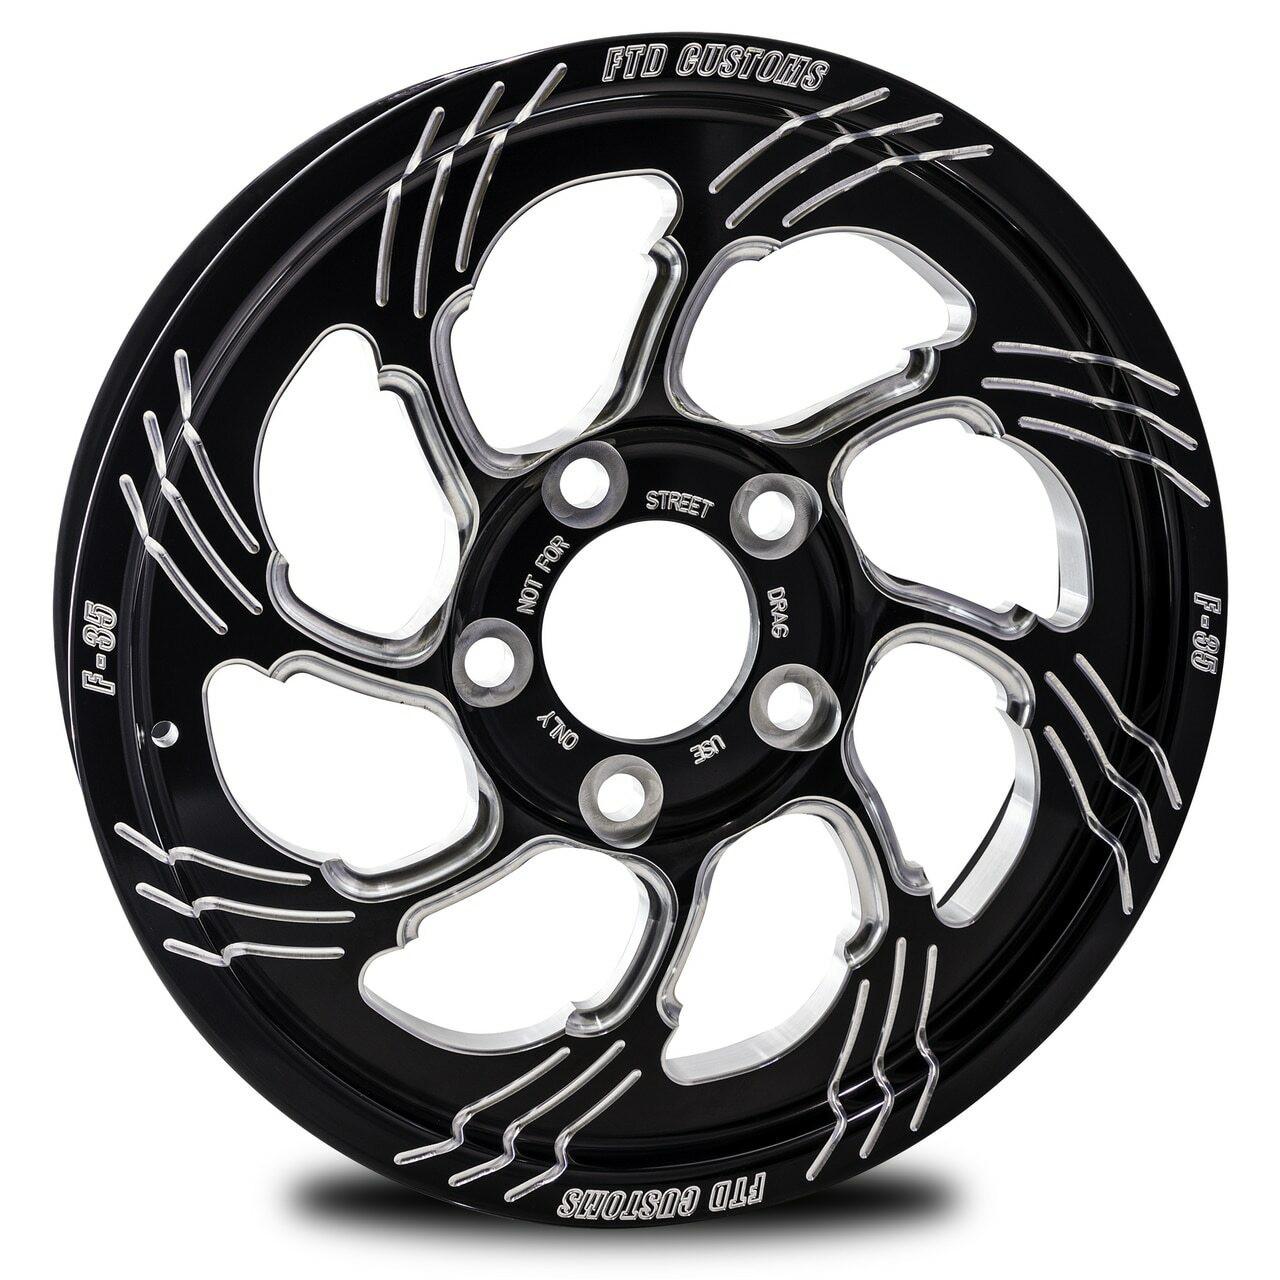 F35 Drag Racing Wheel - FTD Customs Drag Racing Wheels